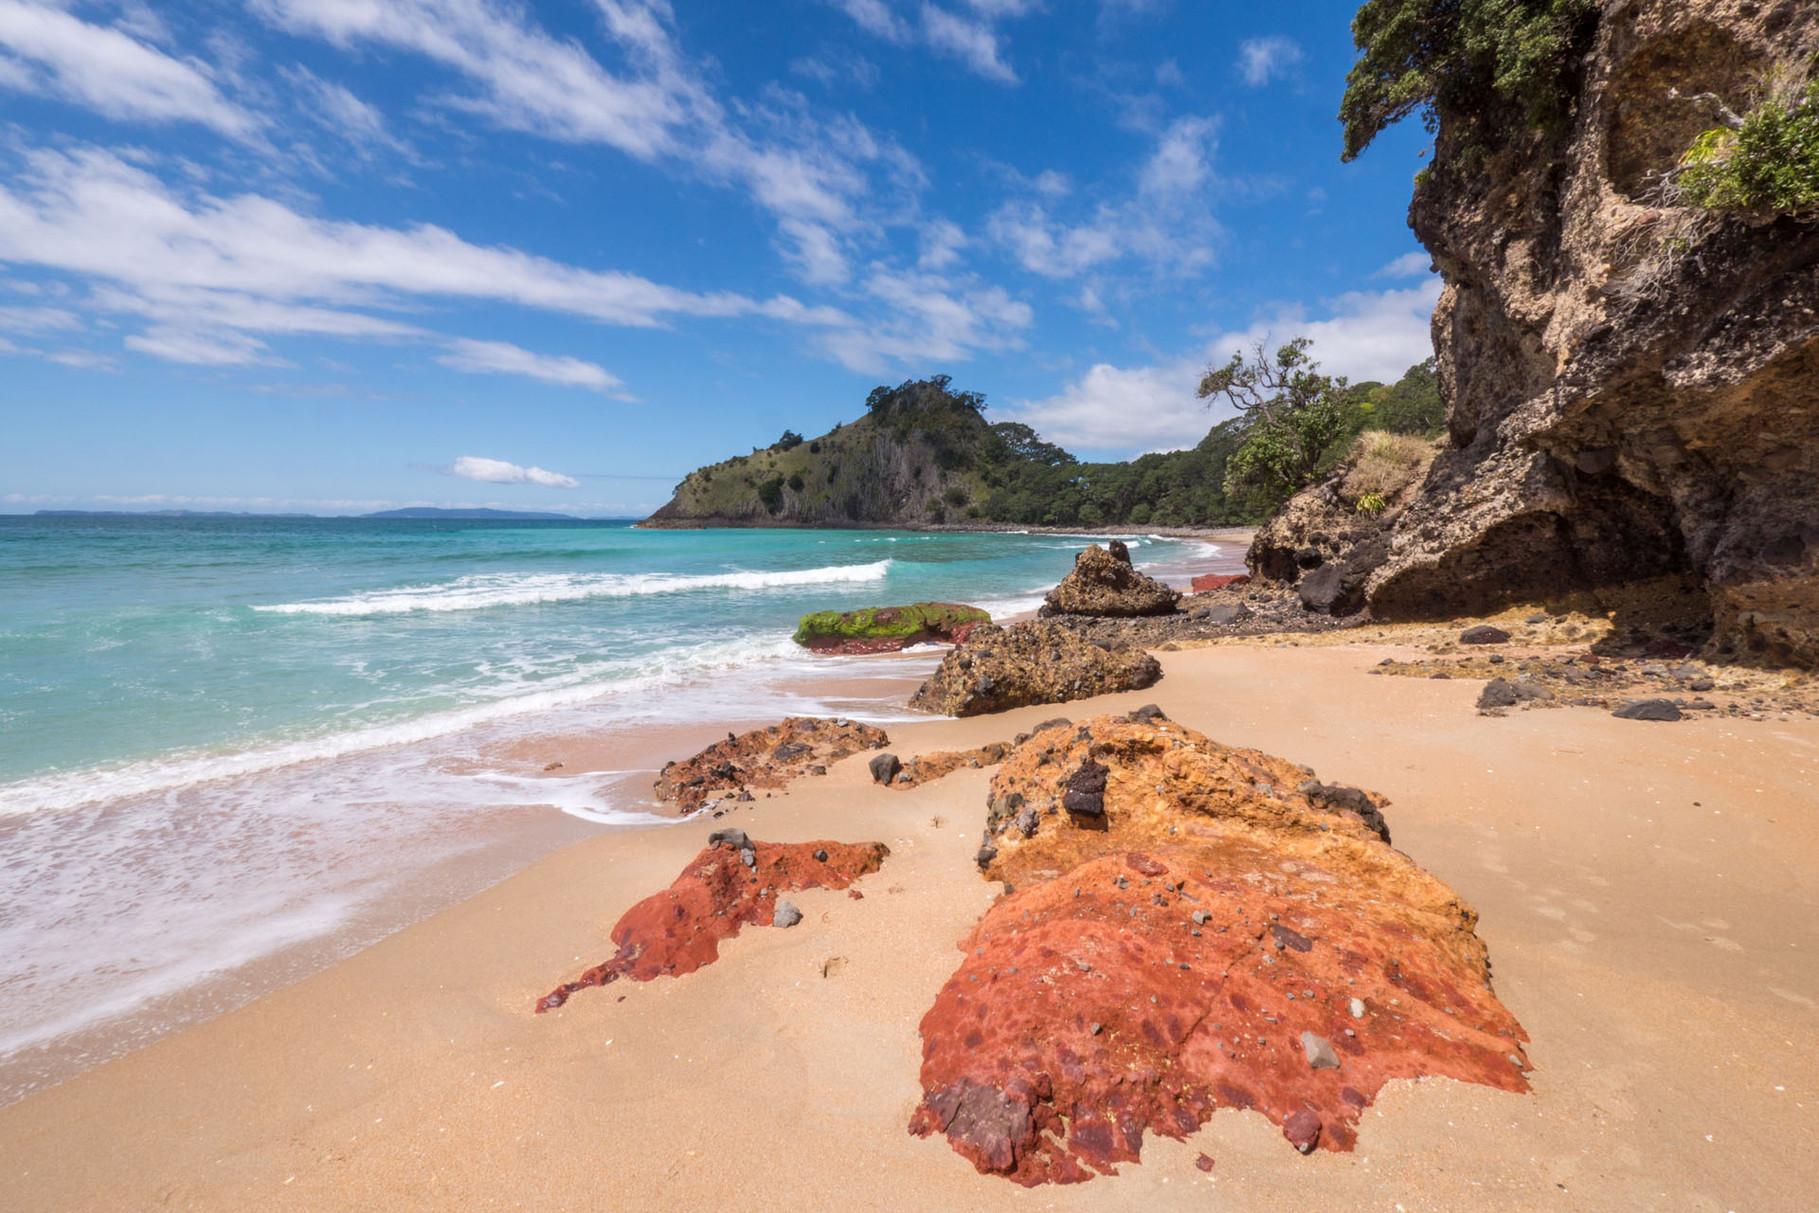 New Chums Beach, Coromandel Peninsula [New Zealand, 2014]